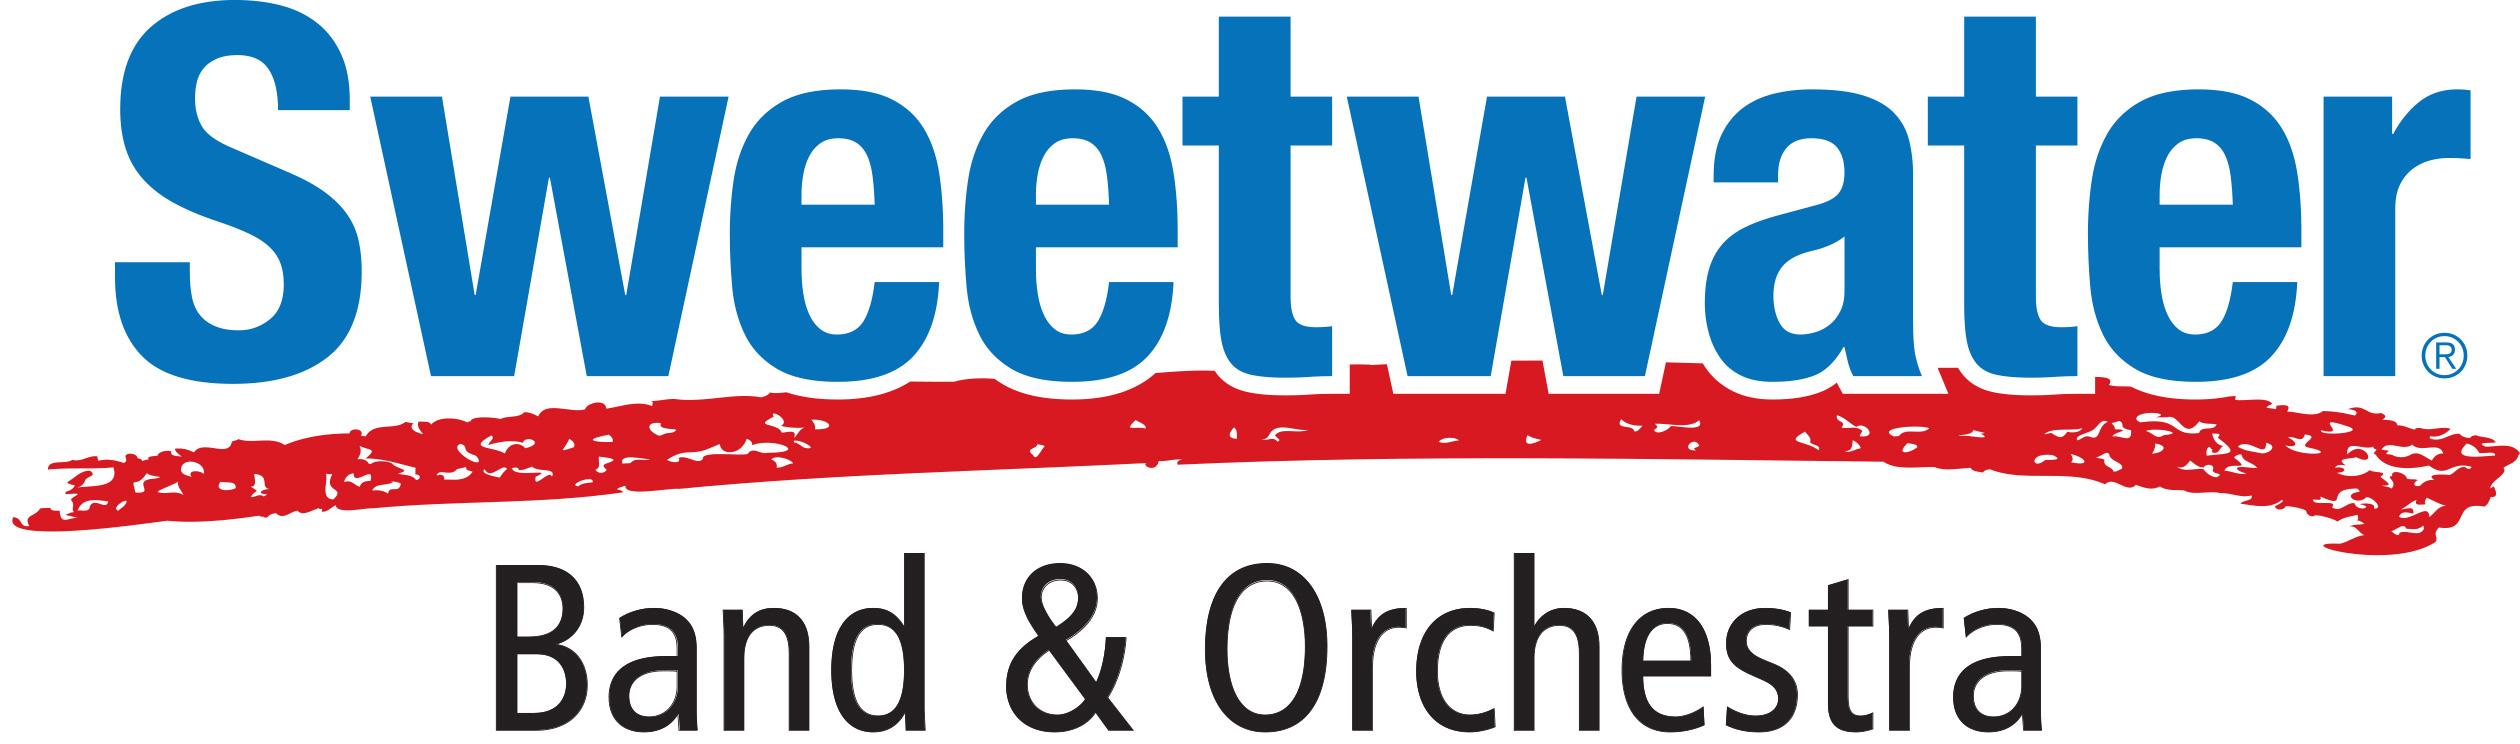 sweetwaterbandorchestra-logo-fullcolor-print